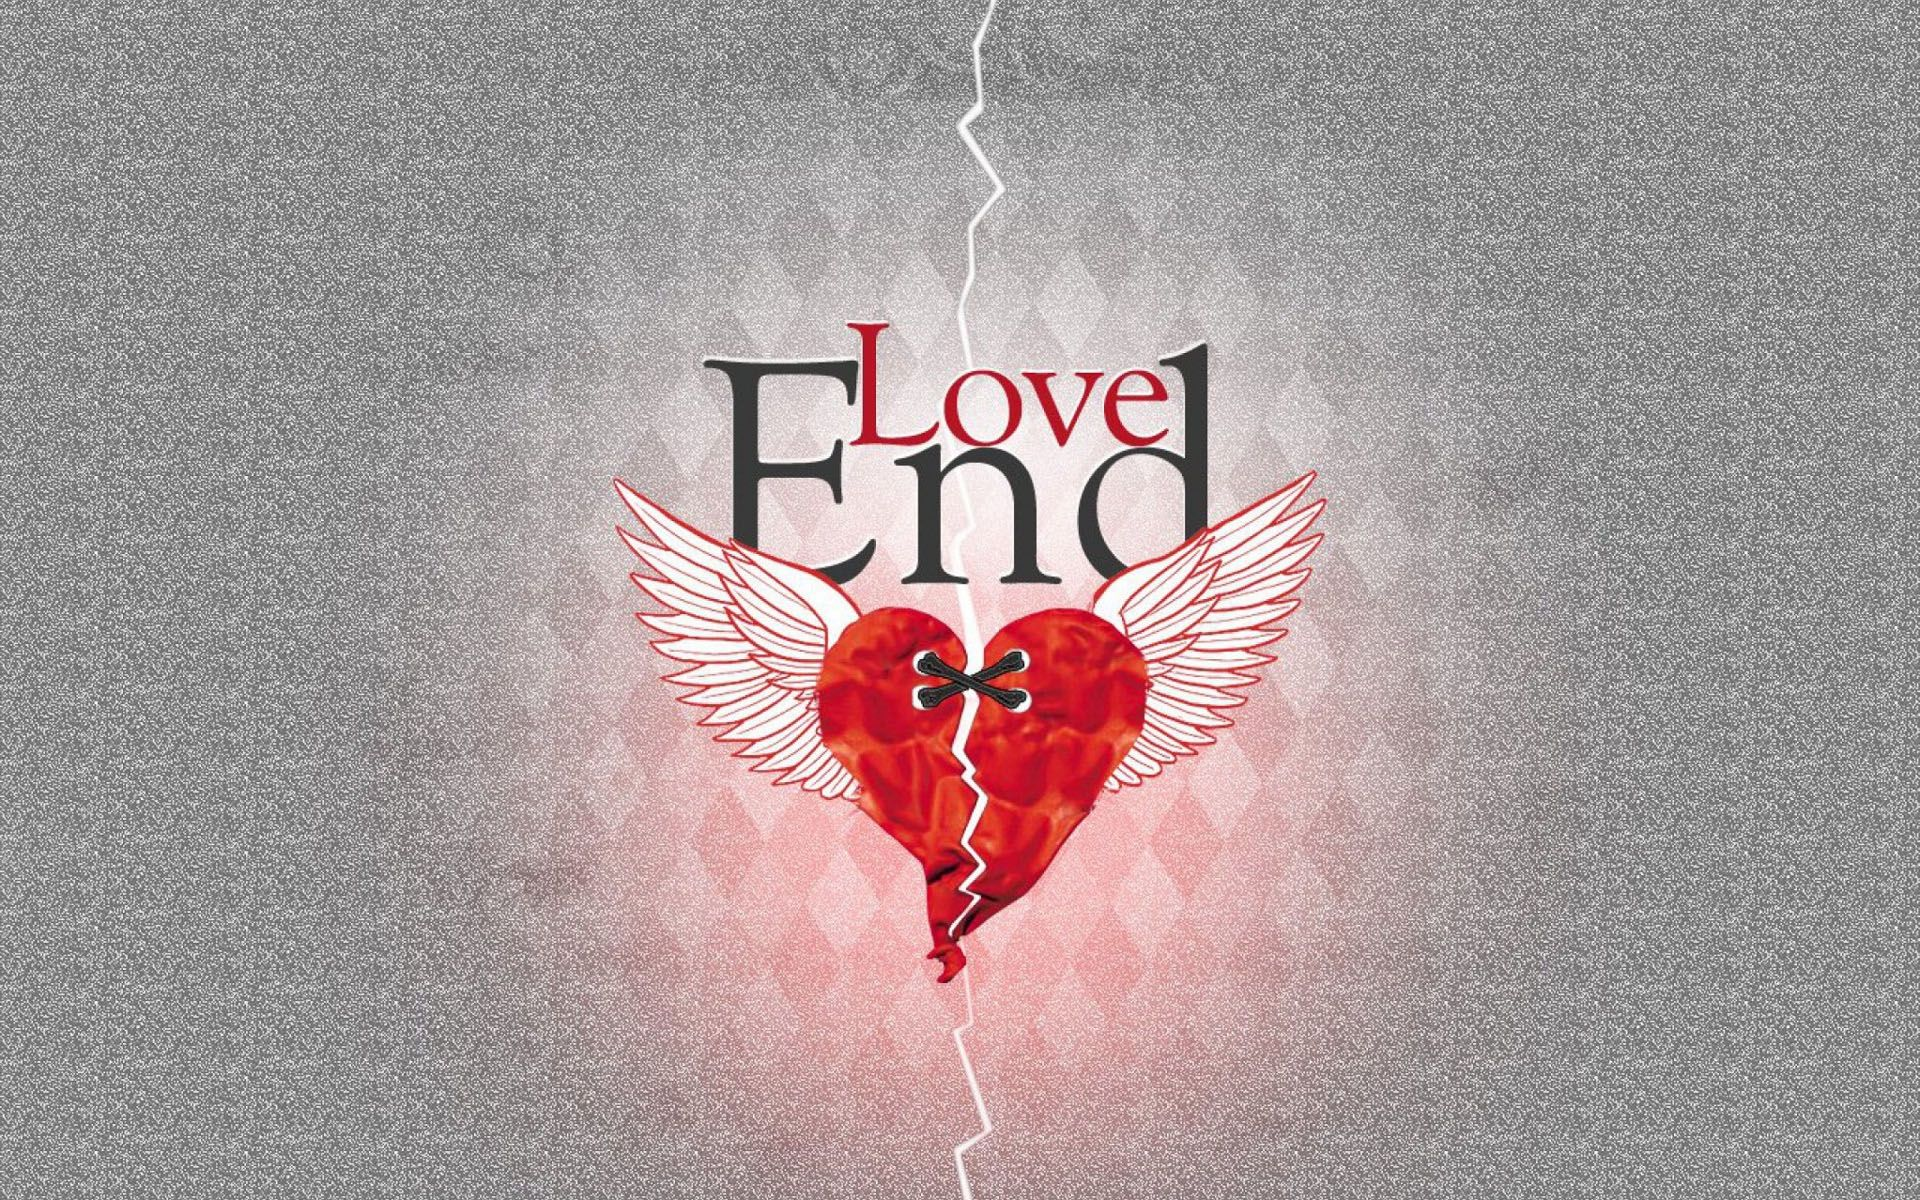 متن انگلیسی شکست عشقی